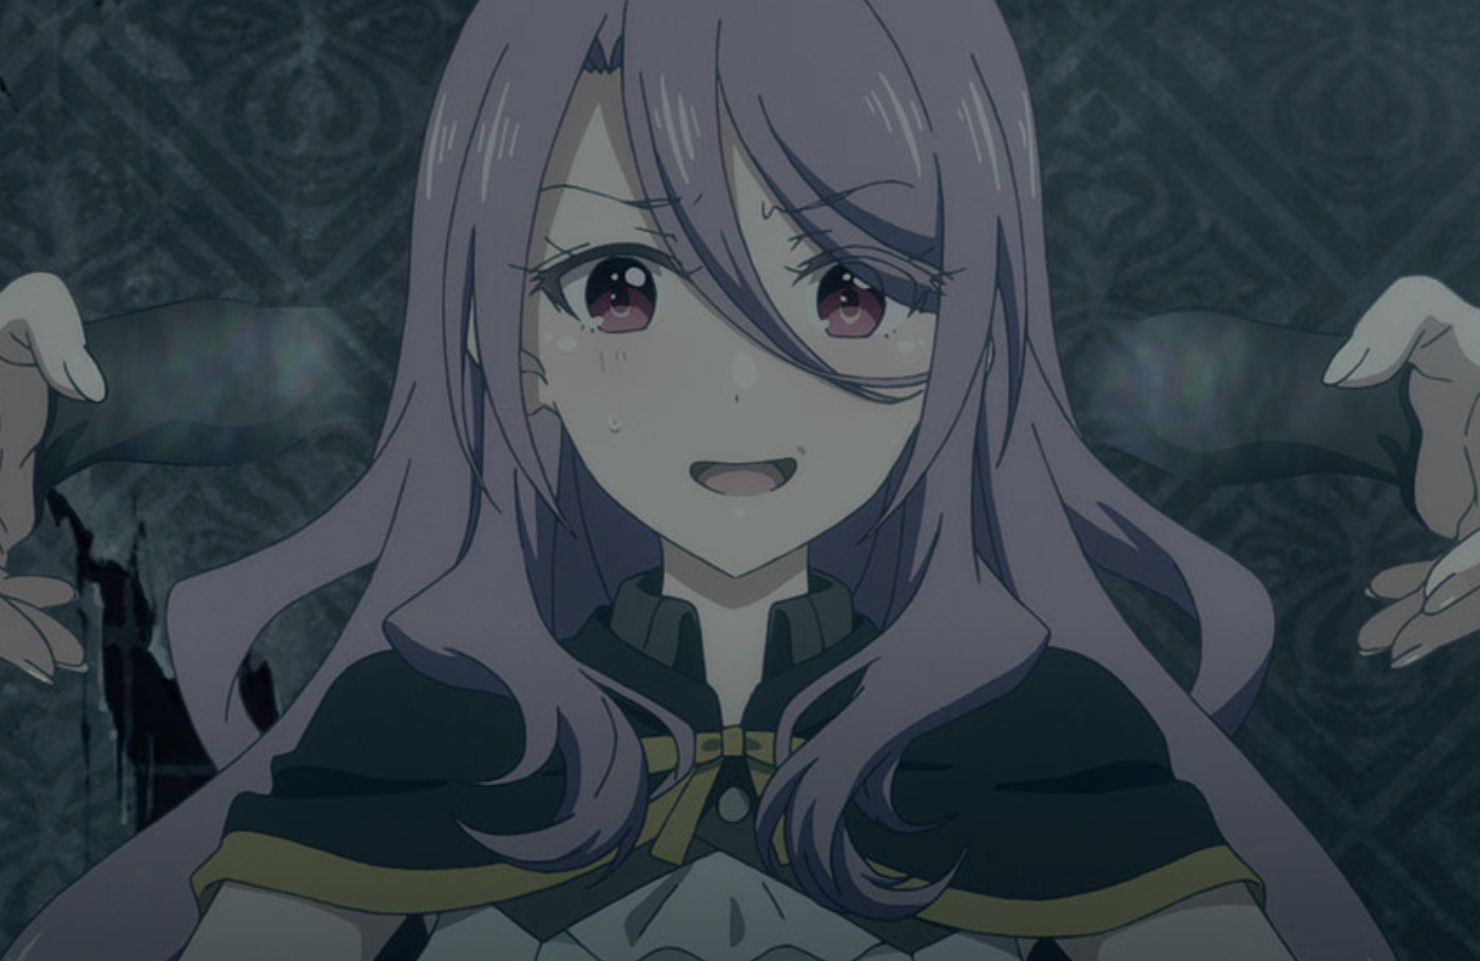 【LapiLi(ラピライ)】アニメ版エミリアのキャラ性と今後を考察